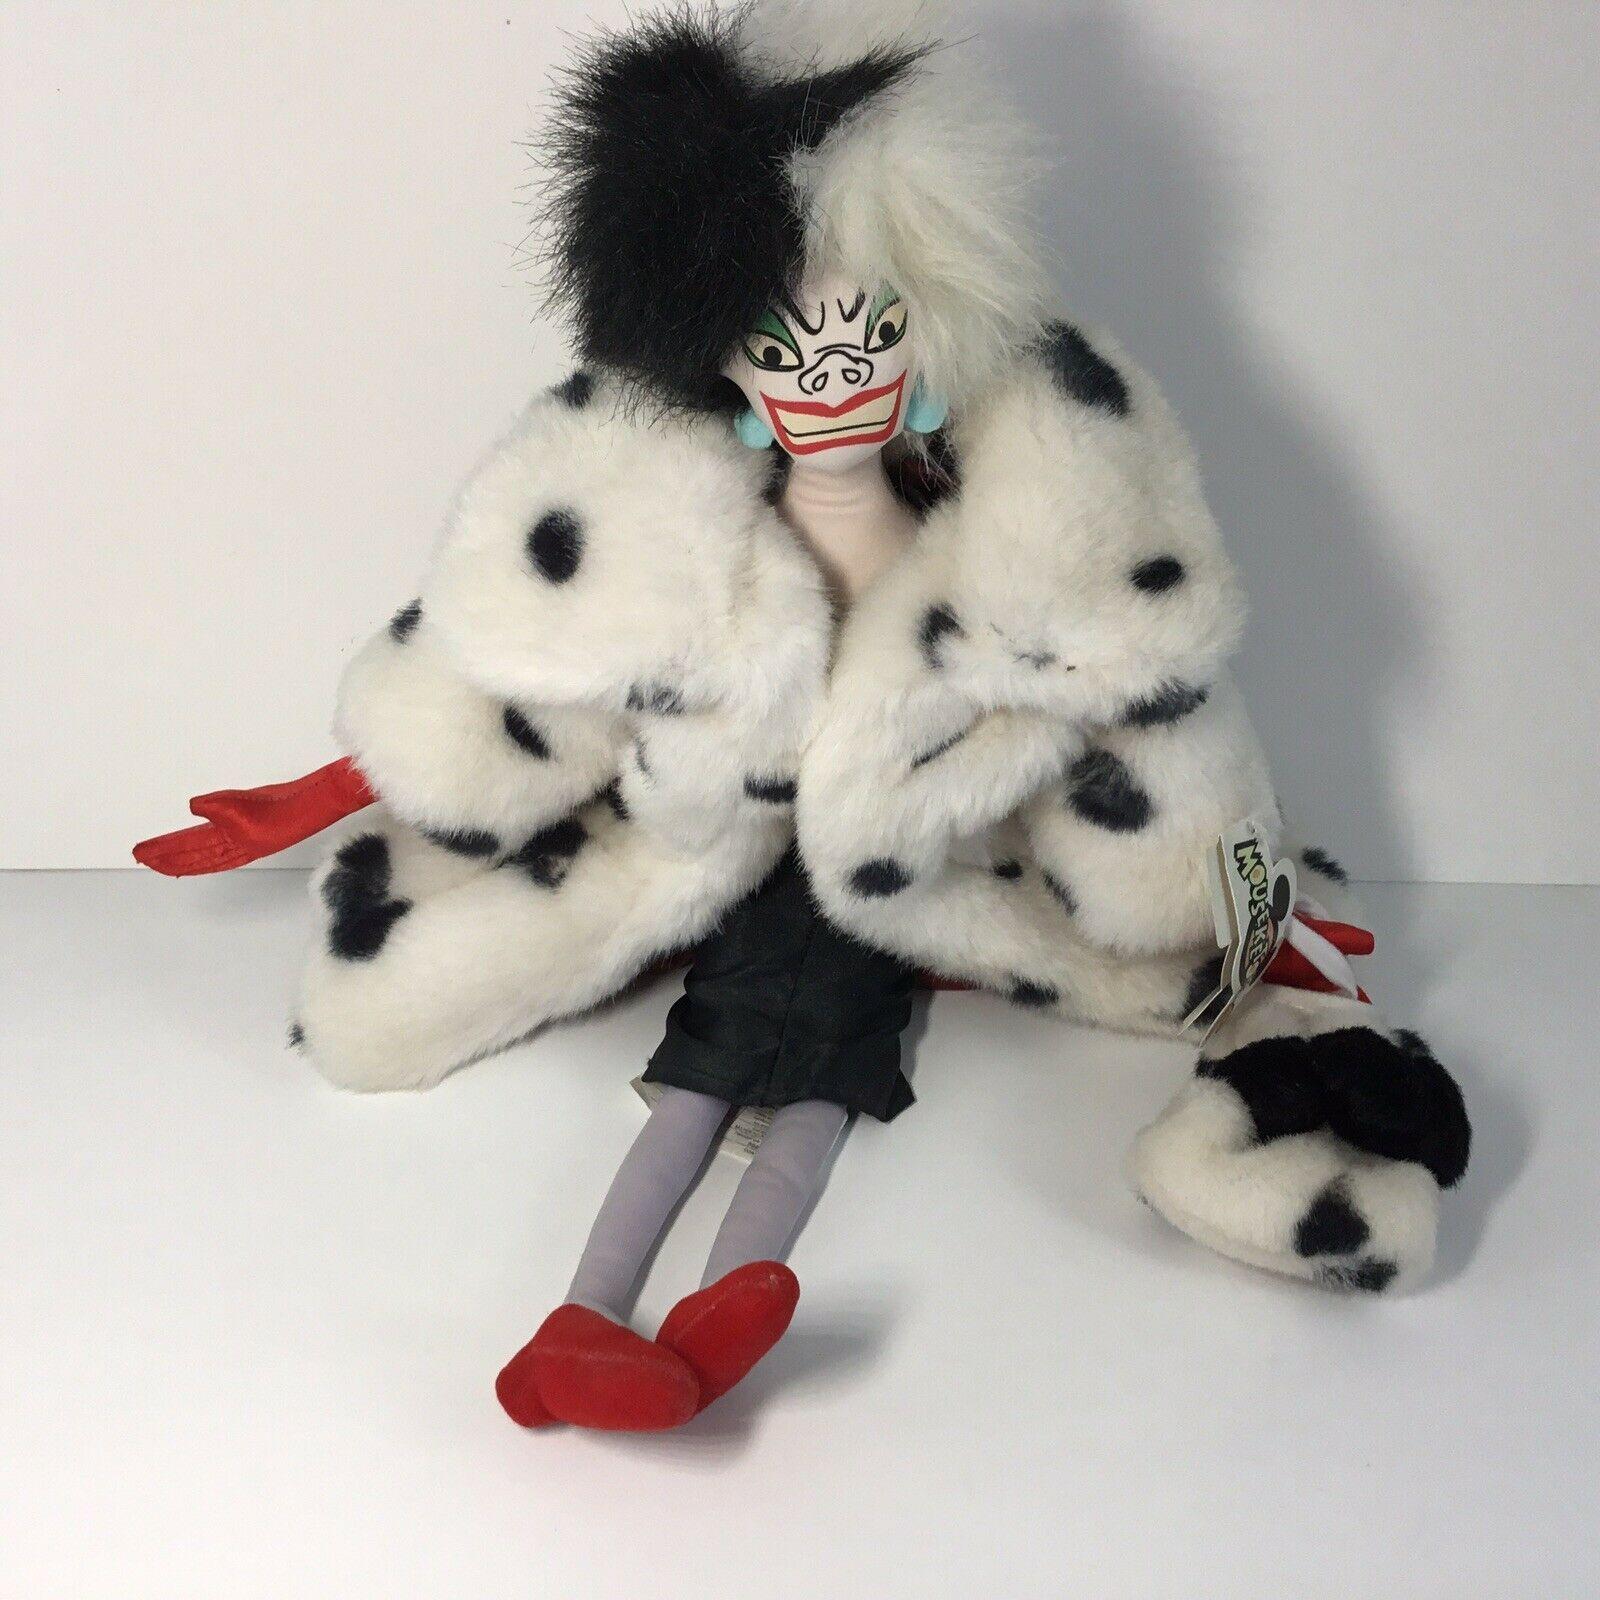 "Disney 101 Dalmatians Villain Plush CRUELLA DE VIL Doll -- 18"" H"